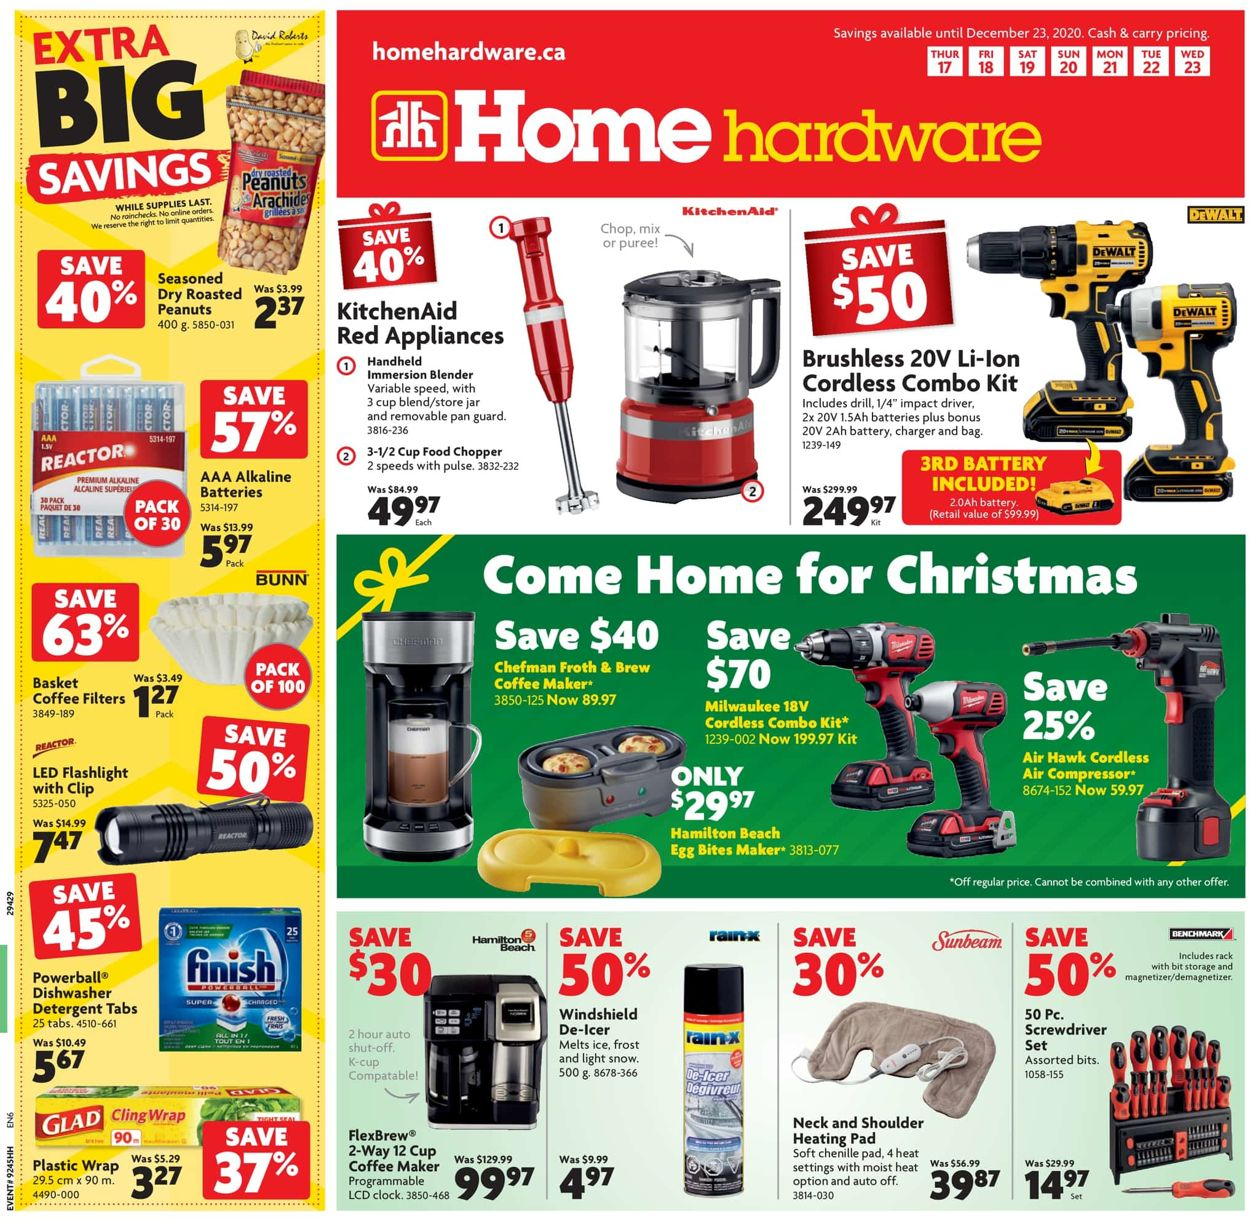 Home Hardware - Christmas 2020 Flyer - 12/17-12/23/2020